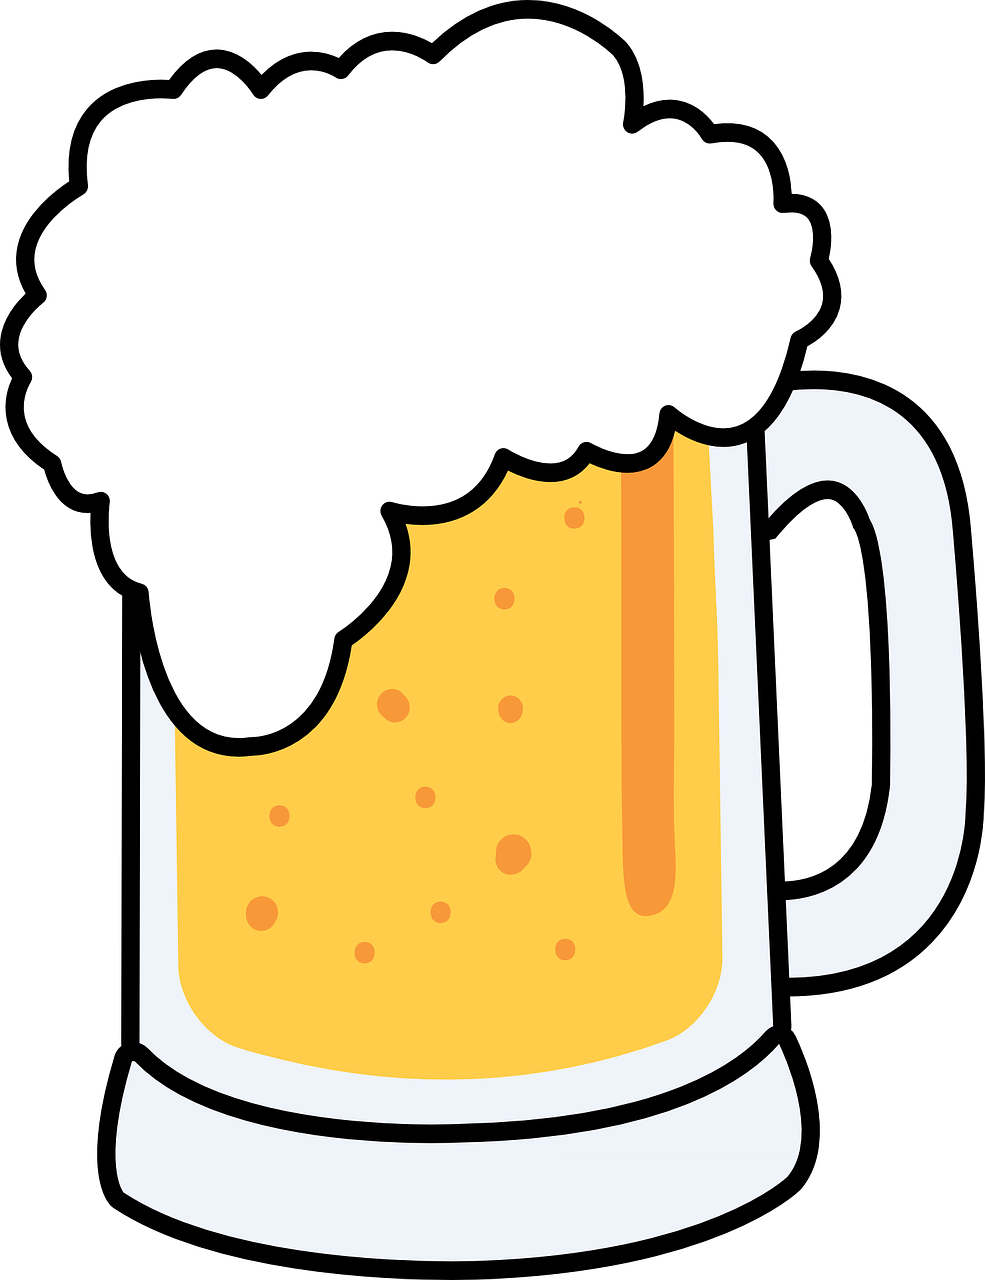 Free Cartoon Beer Mug Clip Art